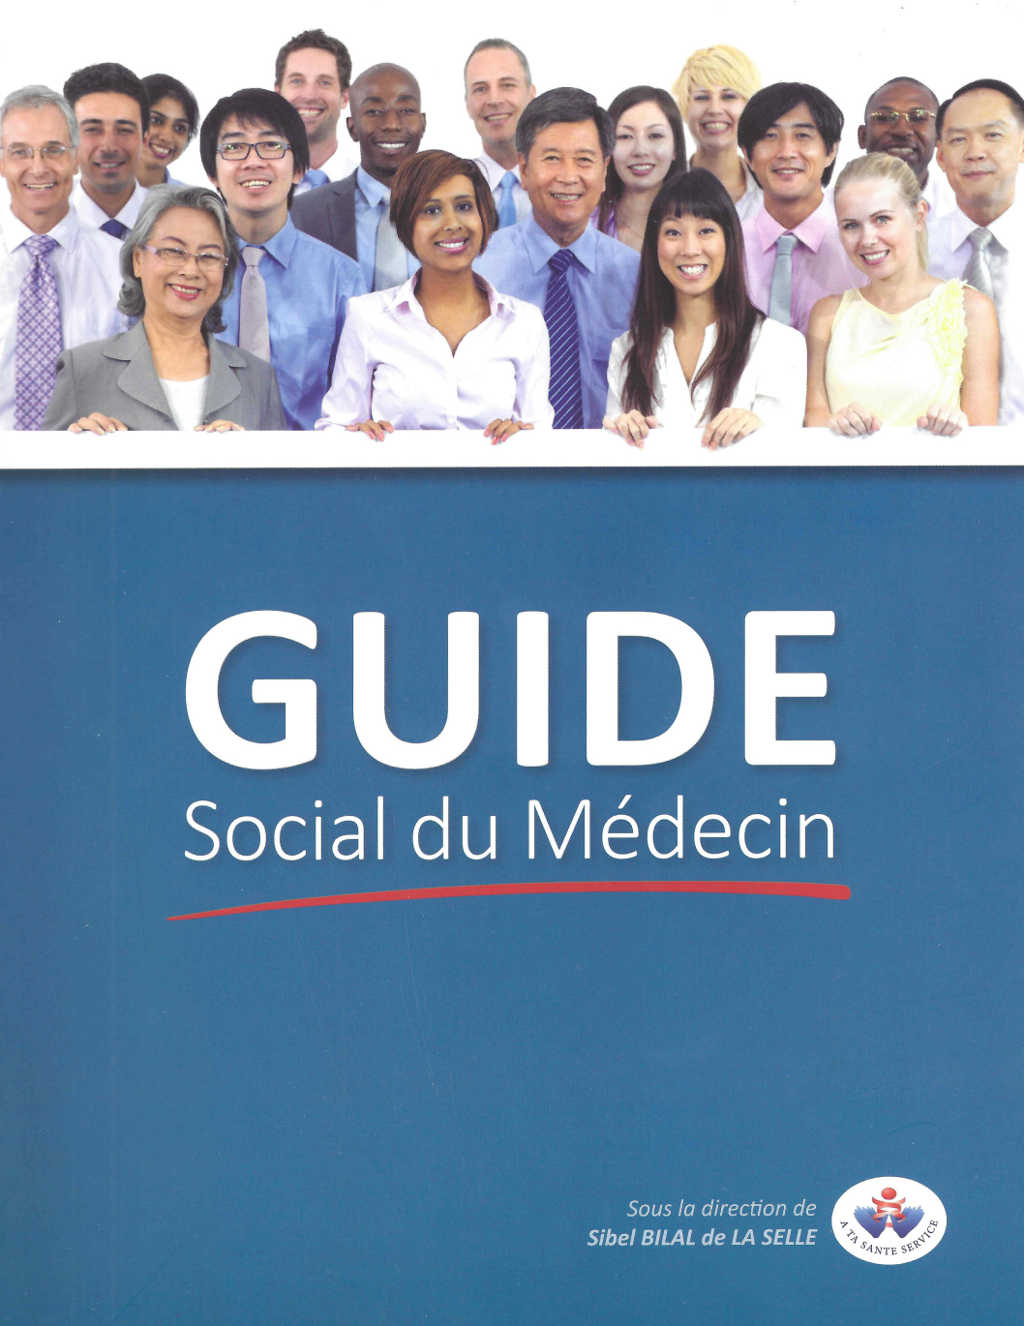 Guide Social du Médecin 2015-A